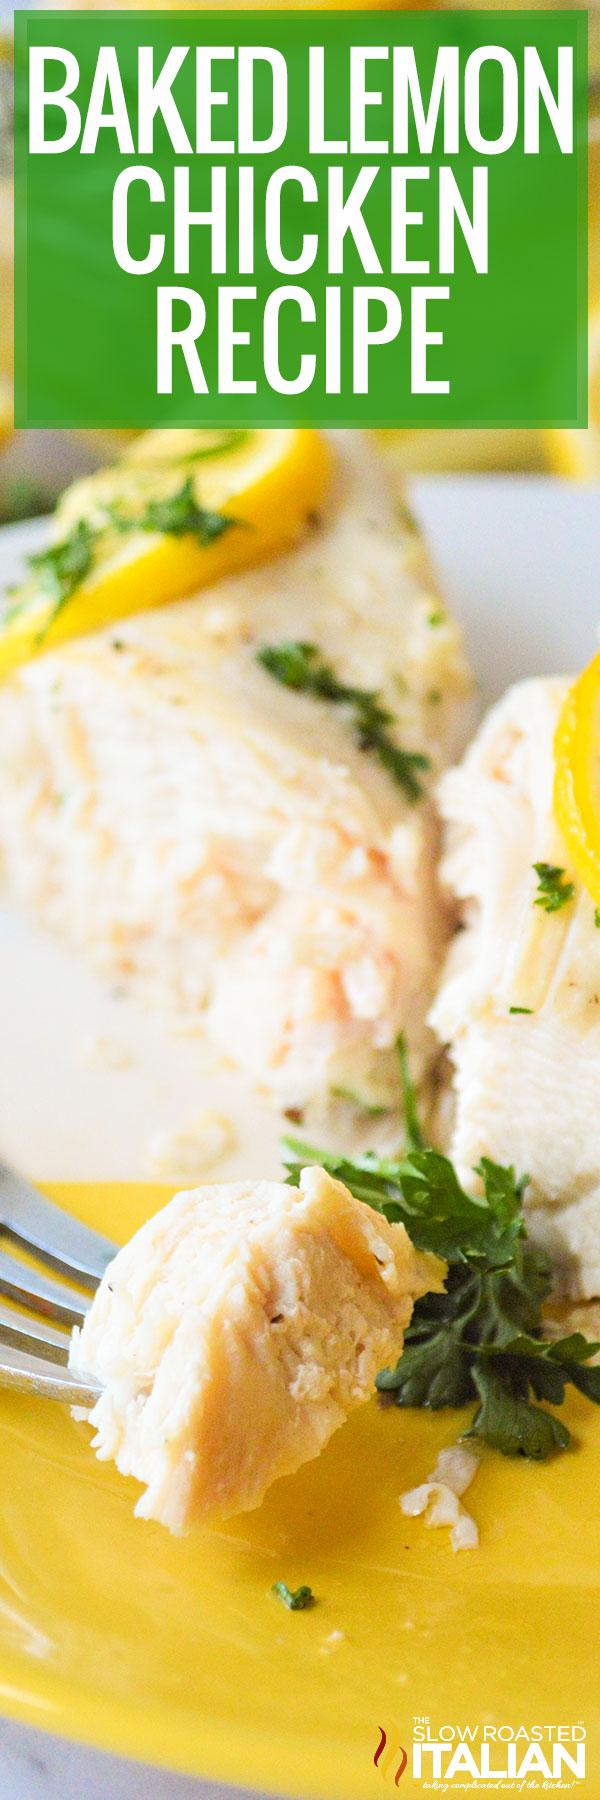 Baked Lemon Chicken Recipe closeup